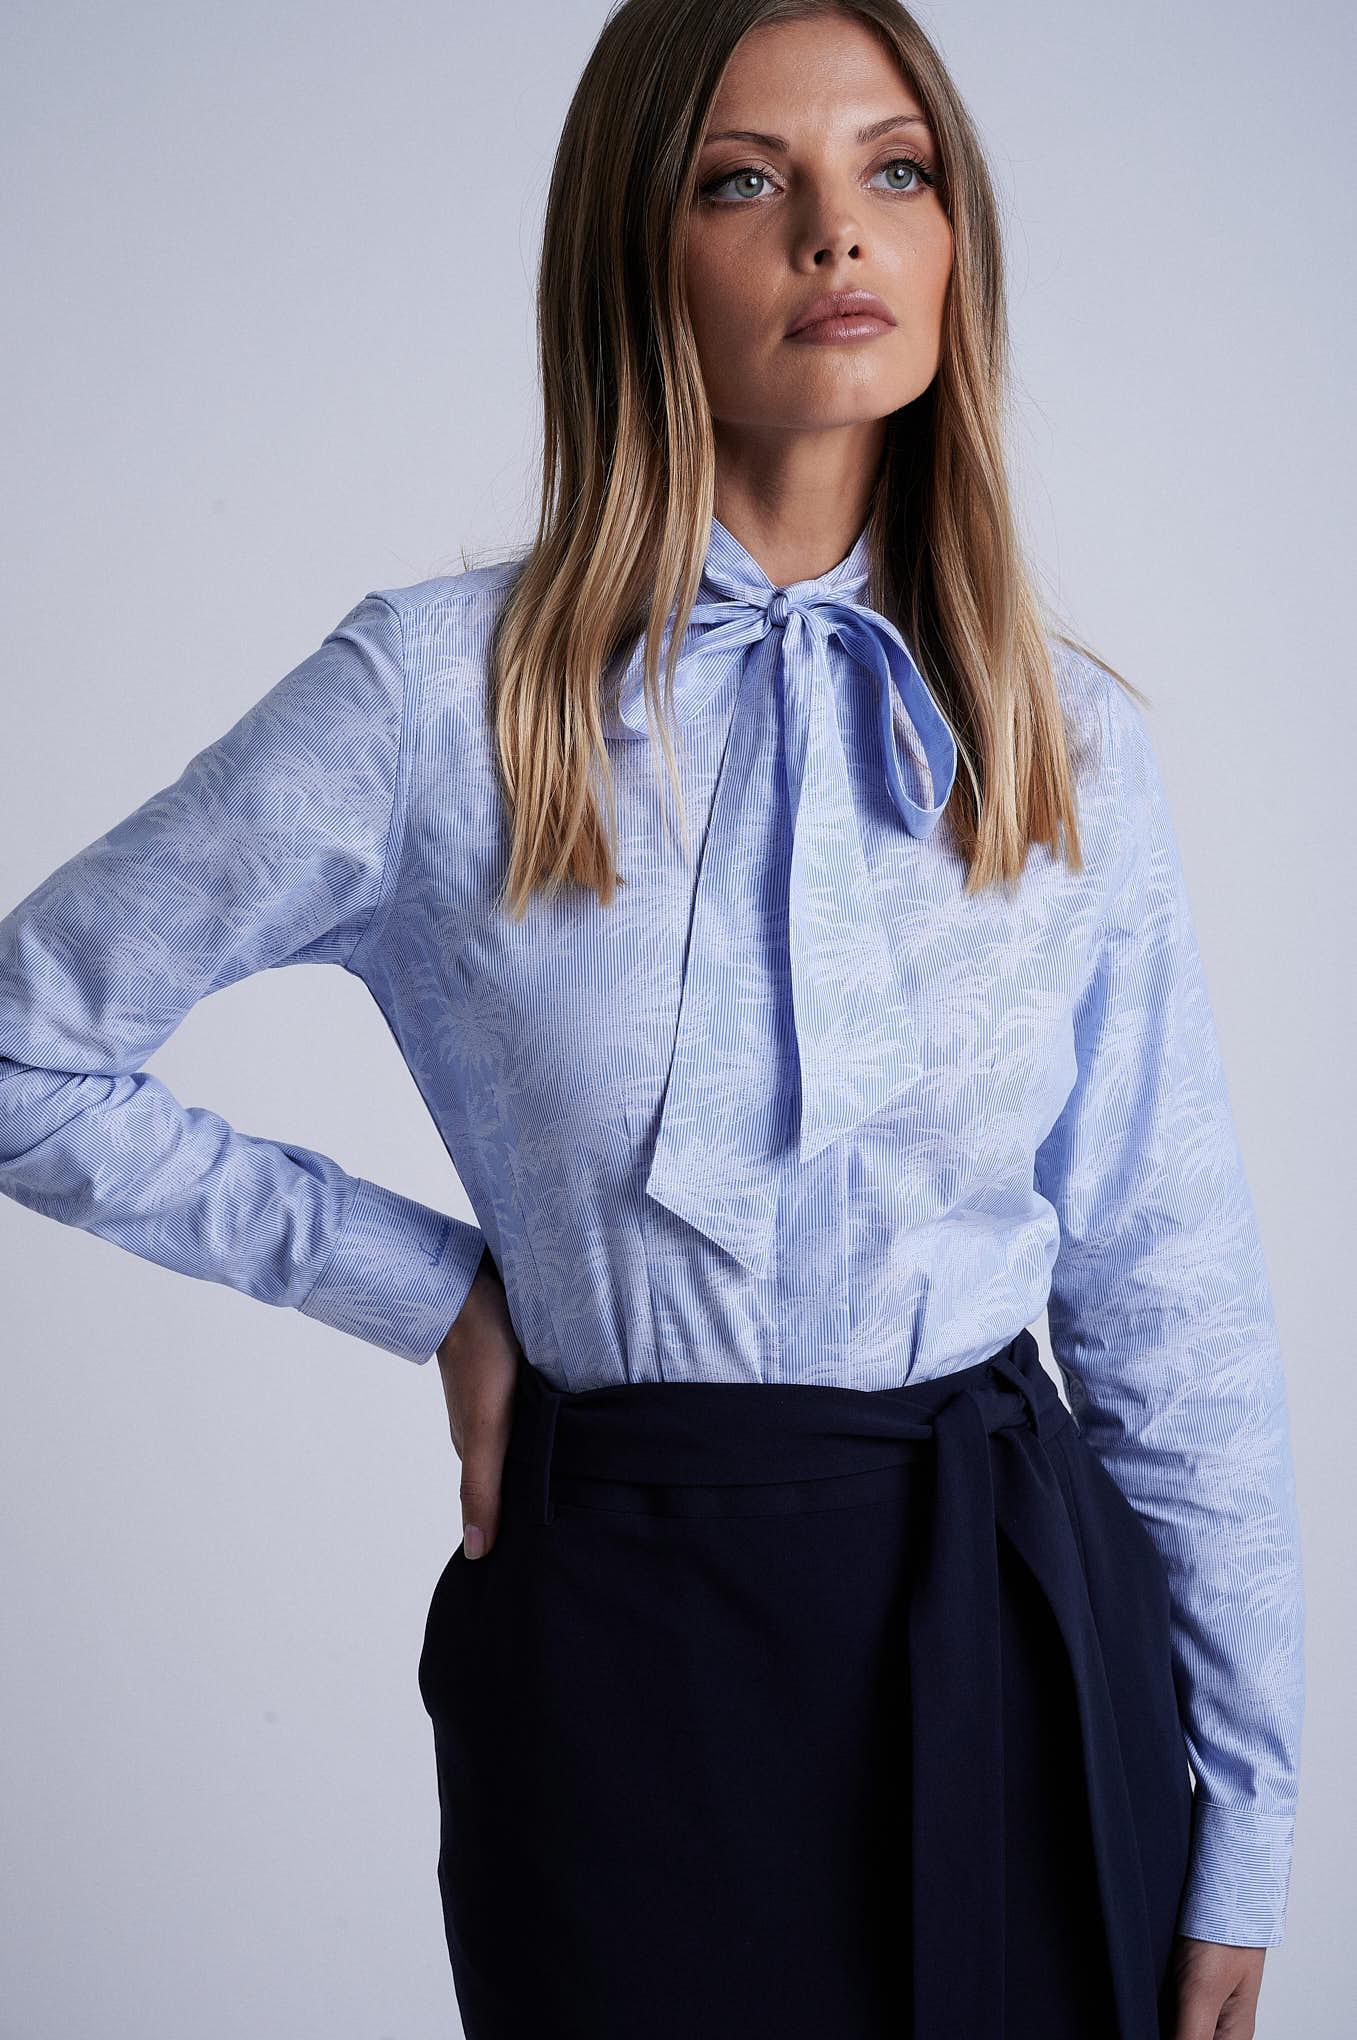 Skirt Dark Blue Formal Woman